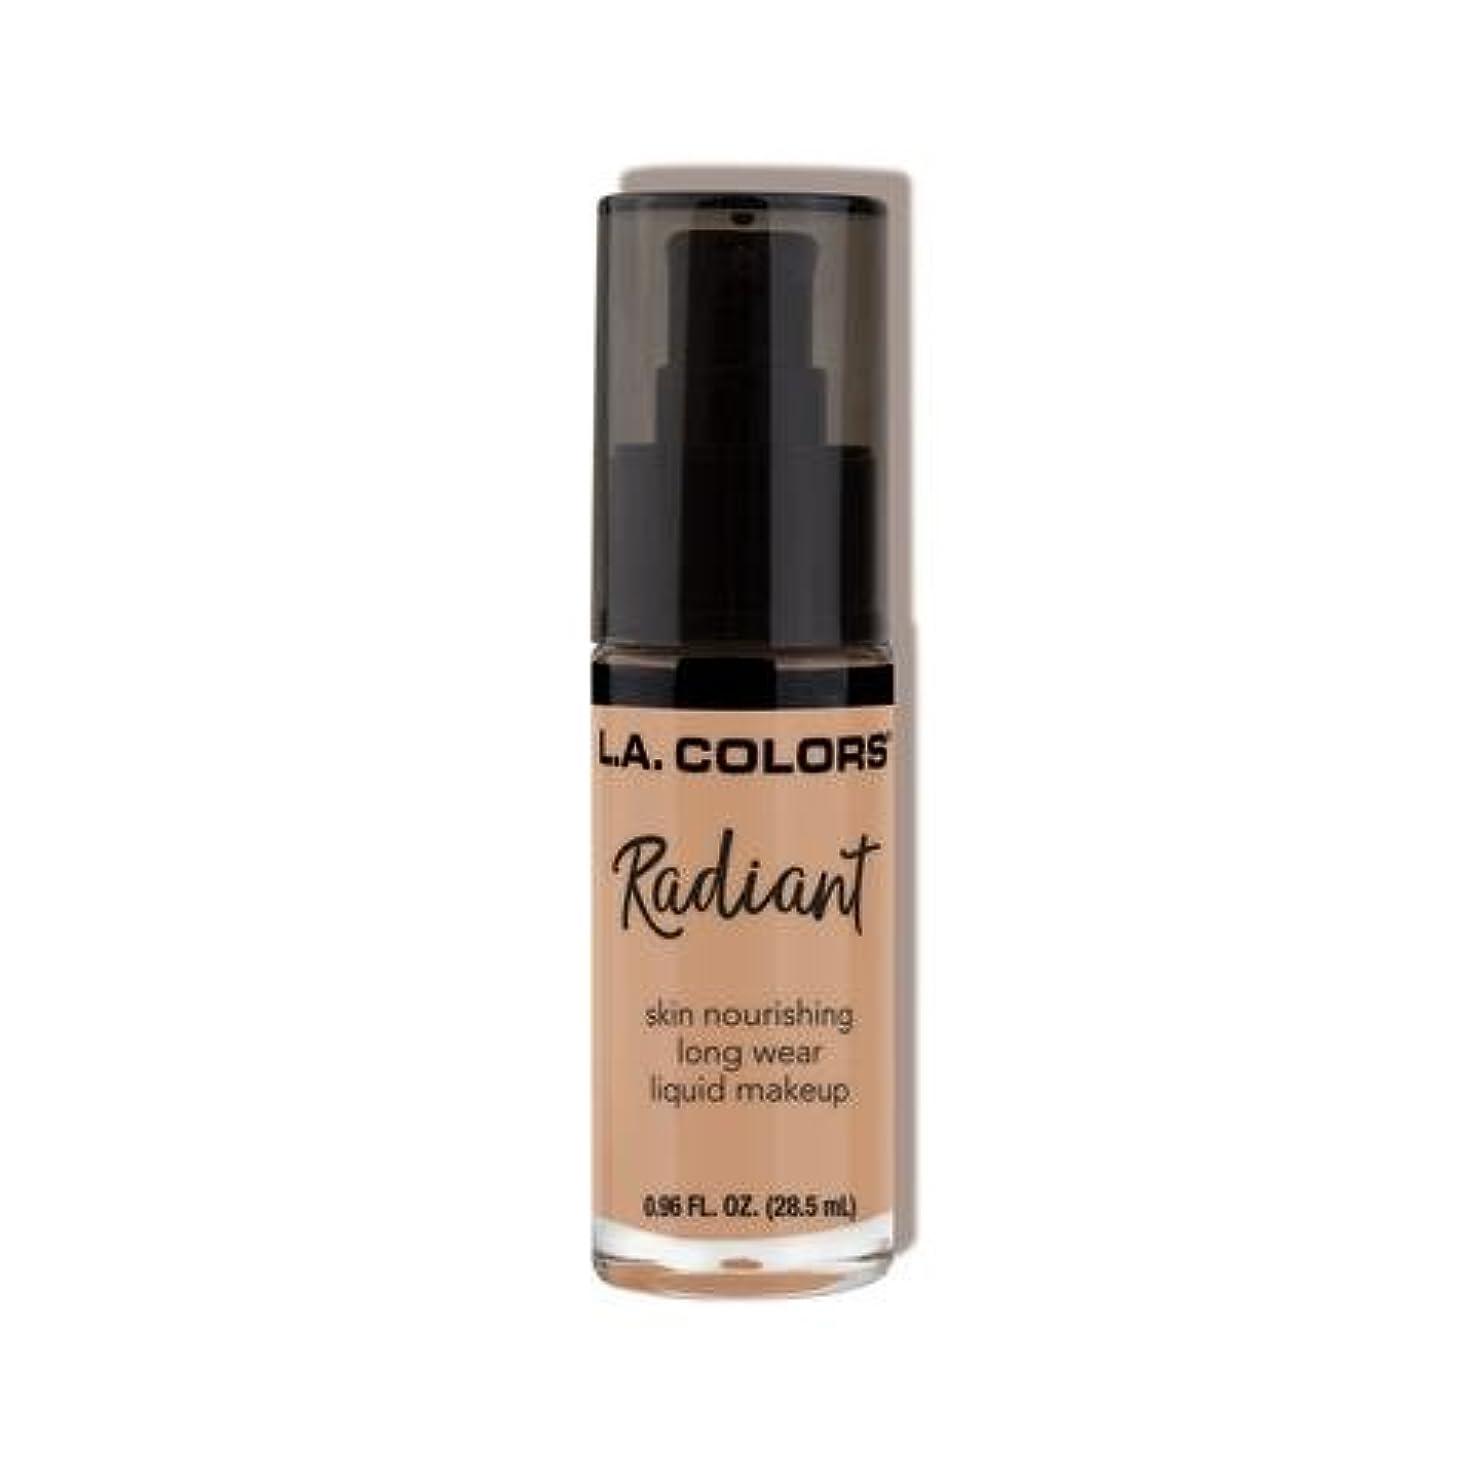 累積最小干渉(3 Pack) L.A. COLORS Radiant Liquid Makeup - Fair (並行輸入品)